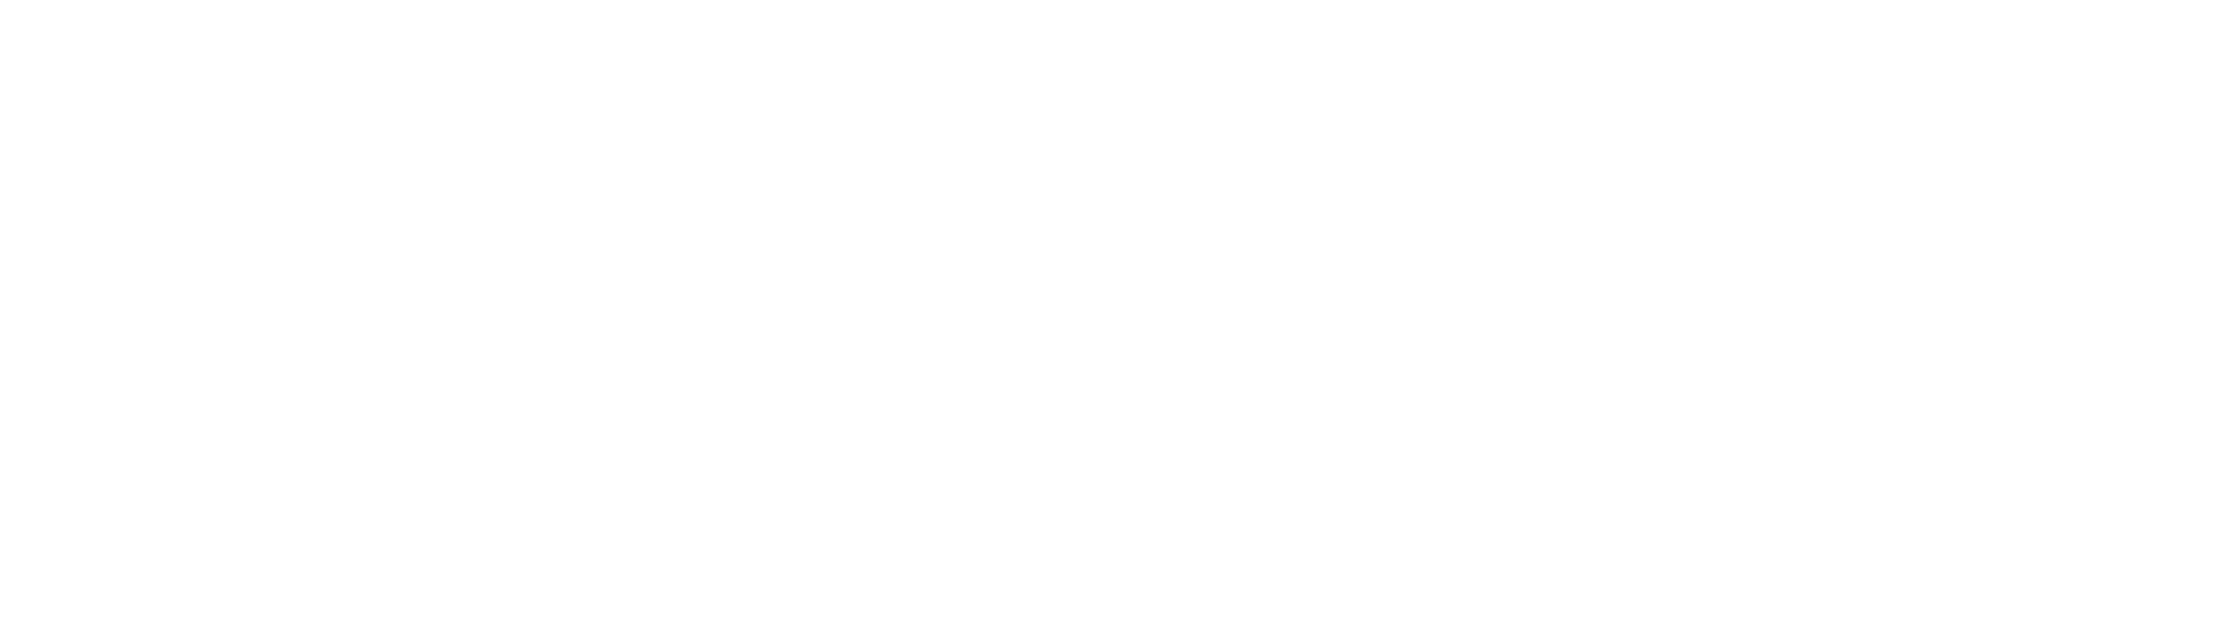 Tuyauterie CT2A